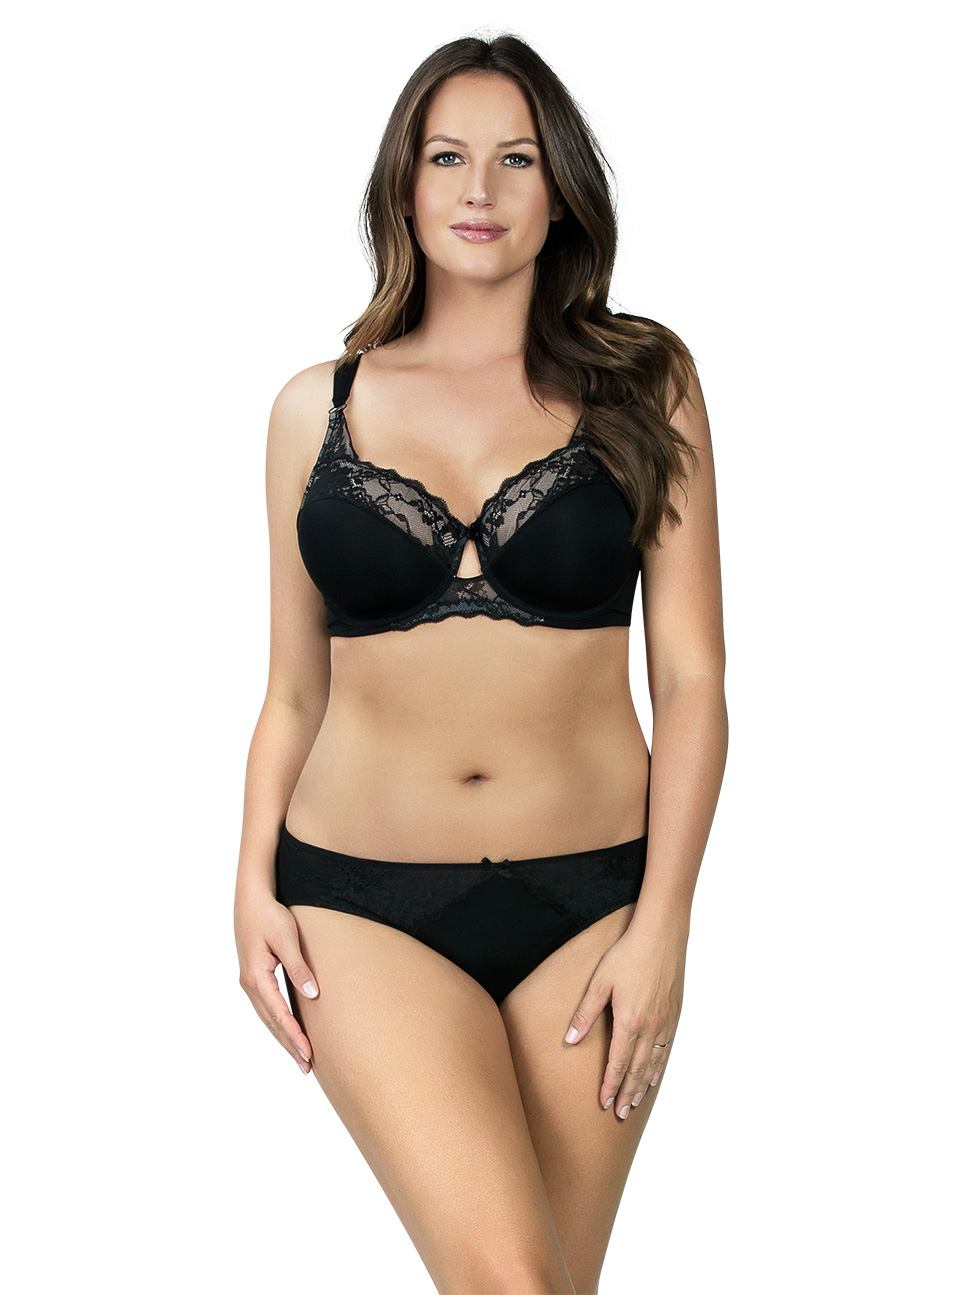 PARFAIT Aubrey PaddedBra P5761 Bikini P5763 Black Front - Aubrey Bikini Black P5763